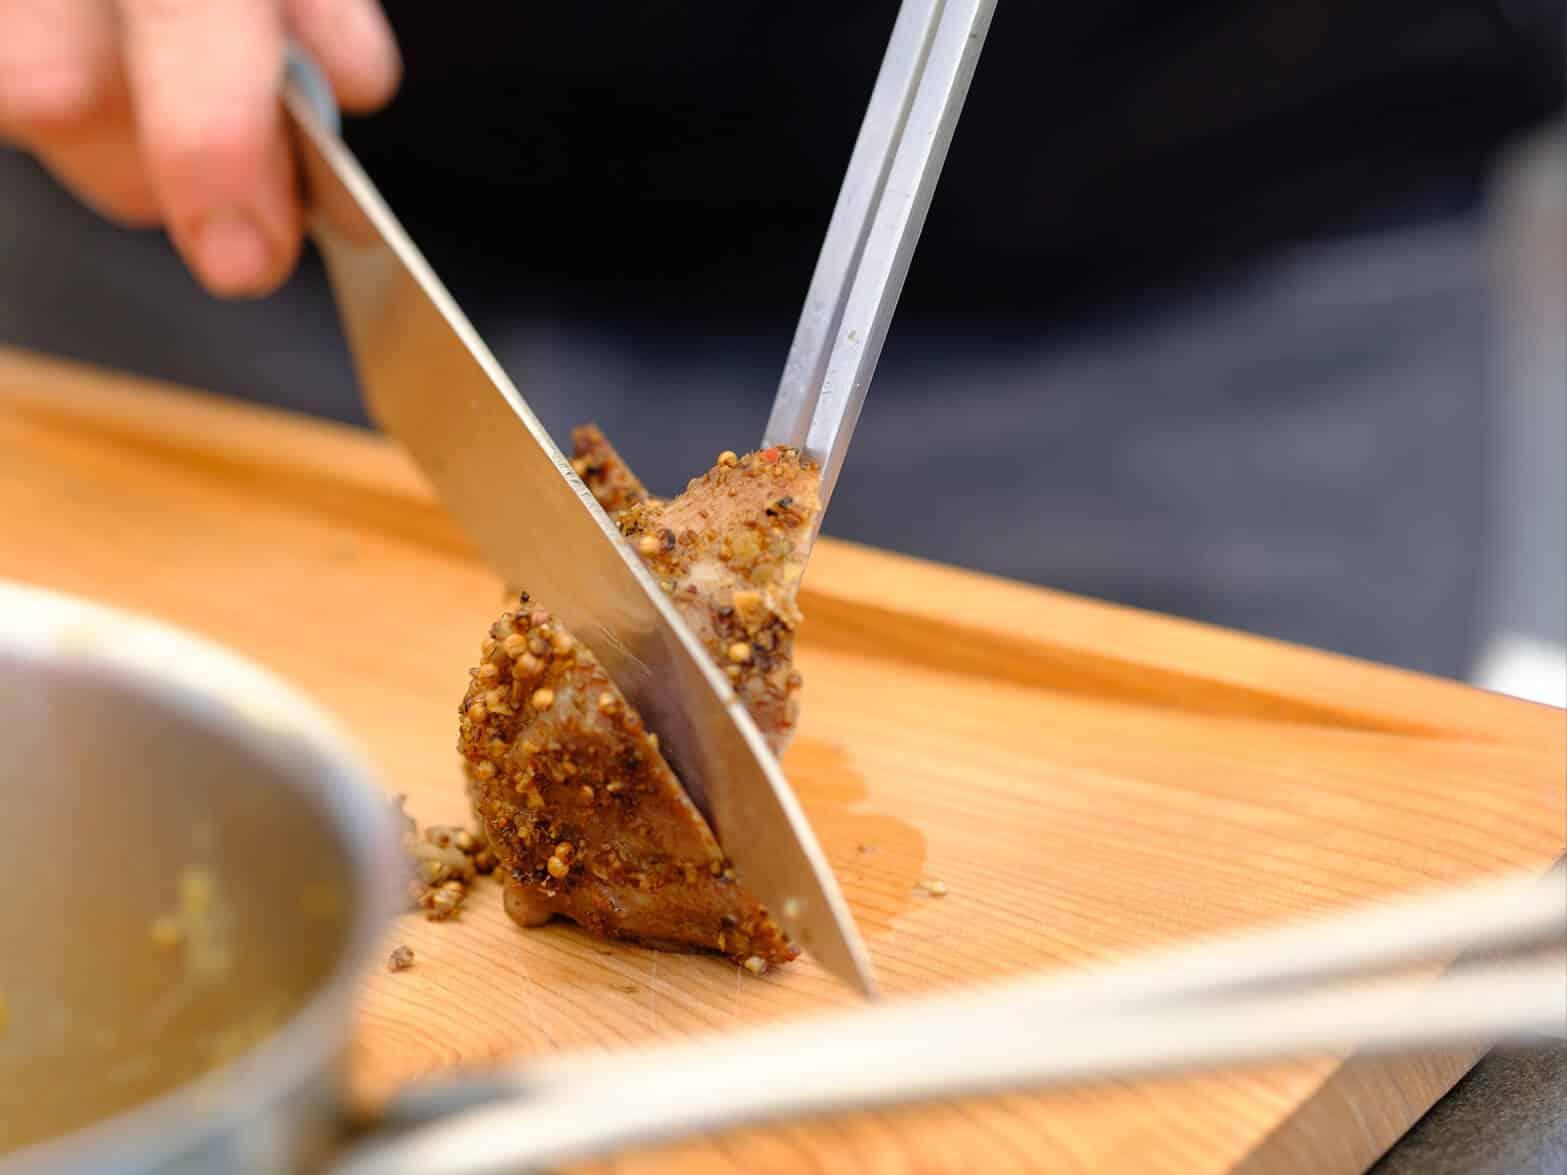 Fleisch wird geschnitten